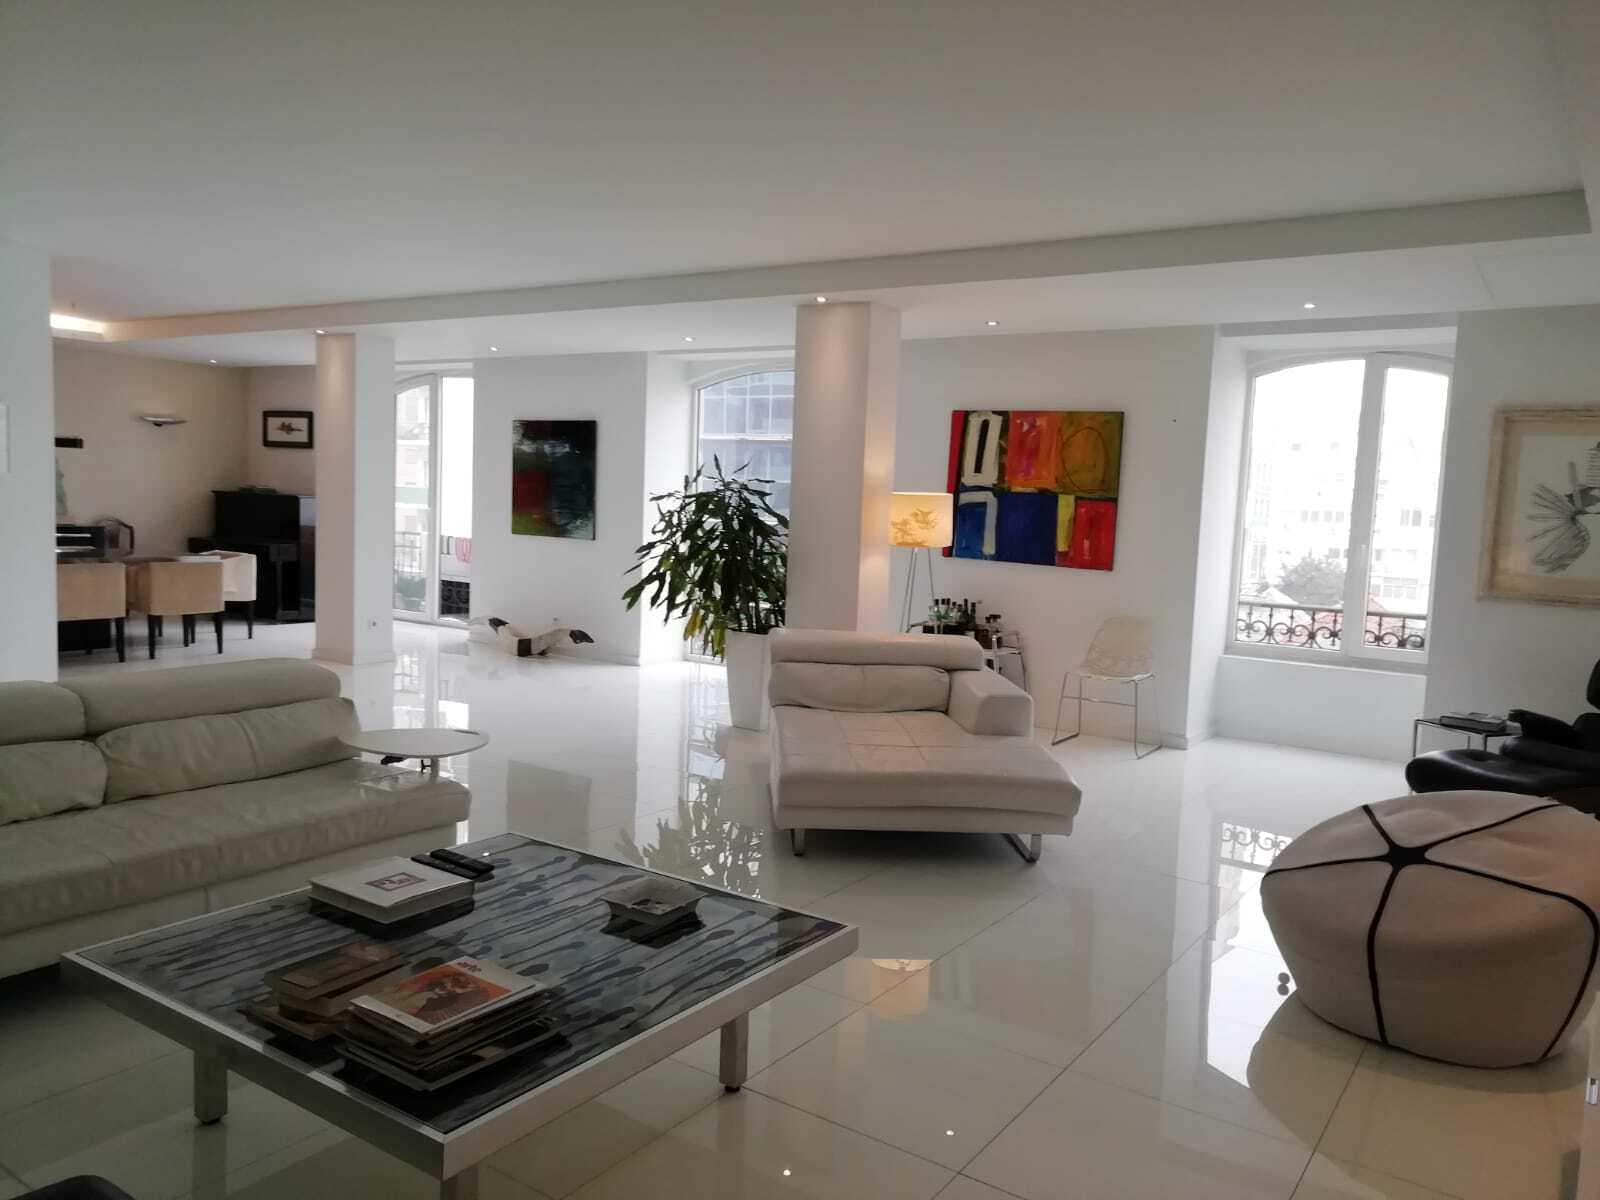 pf18758-apartamento-t6-lisboa-f8415ad1-de72-4cbb-856d-88cb17e3f3b3